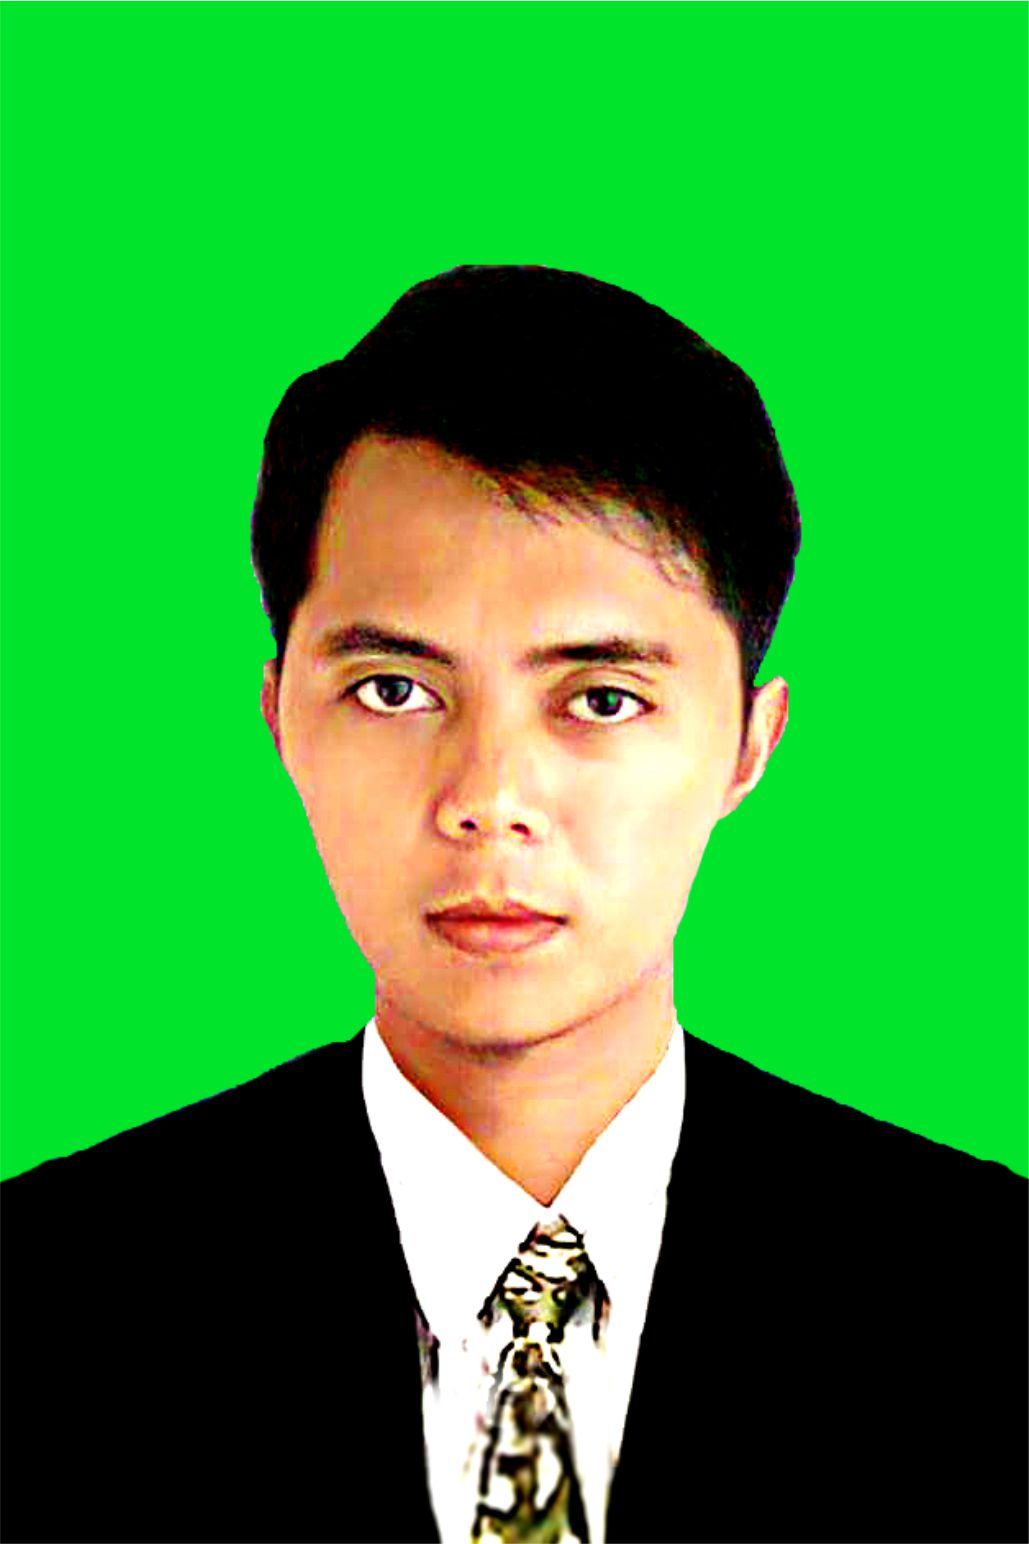 Guru Geri Daryat Saputra, S.Pd SMK Taruna Harapan 1 Cipatat